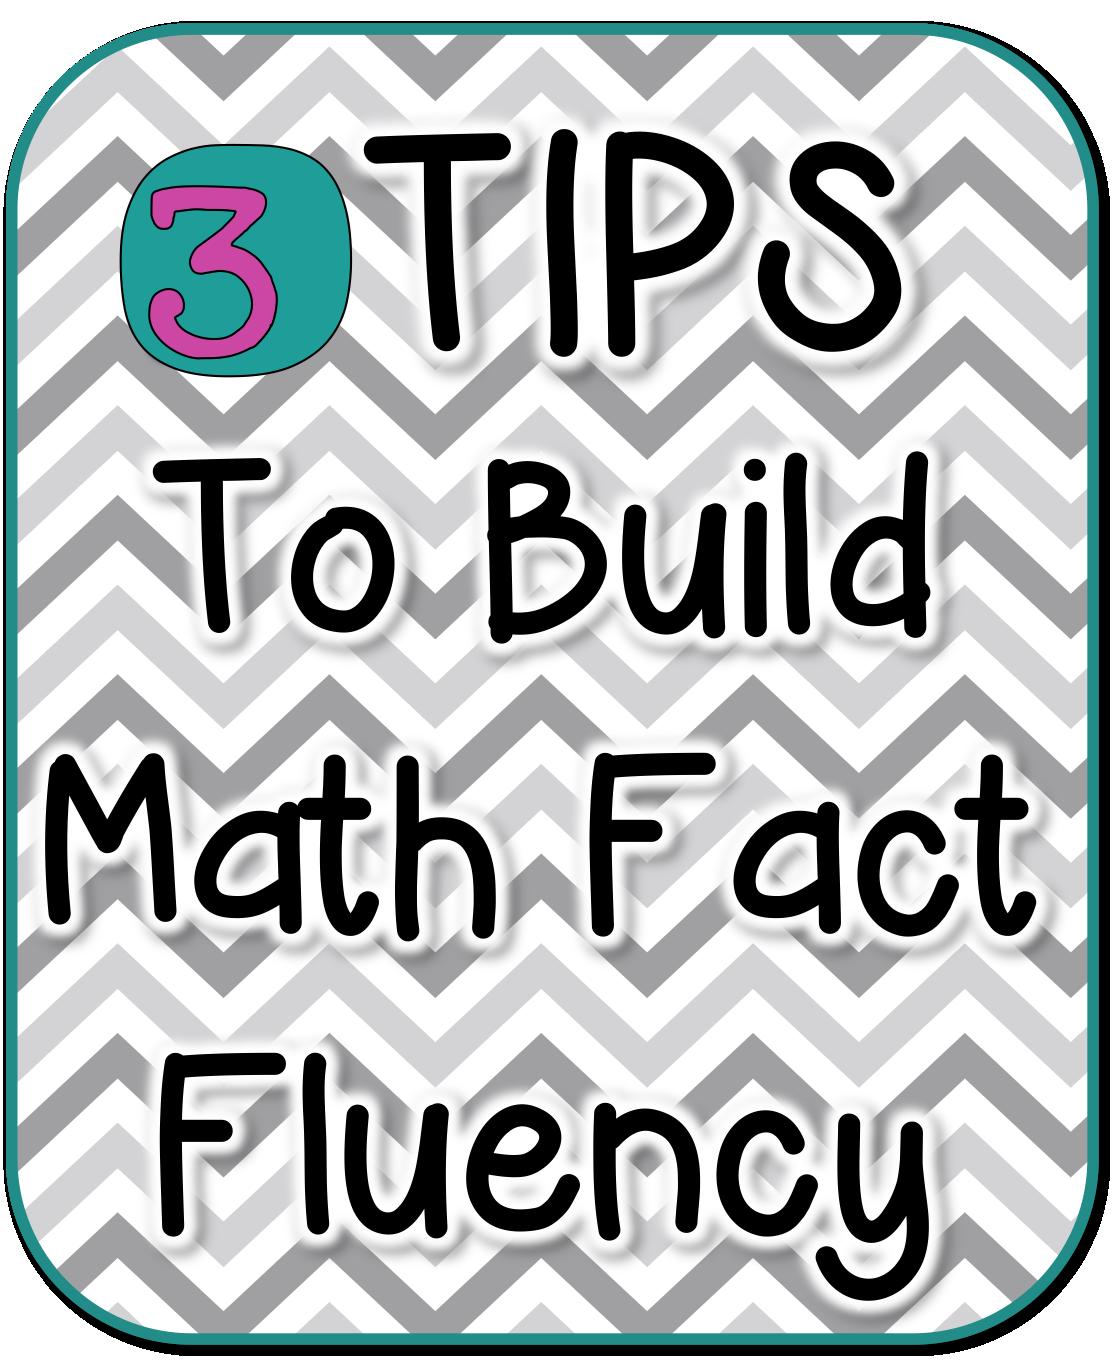 3 Tips to Build Math Fact Fluency | Math fact practice, Build math ...